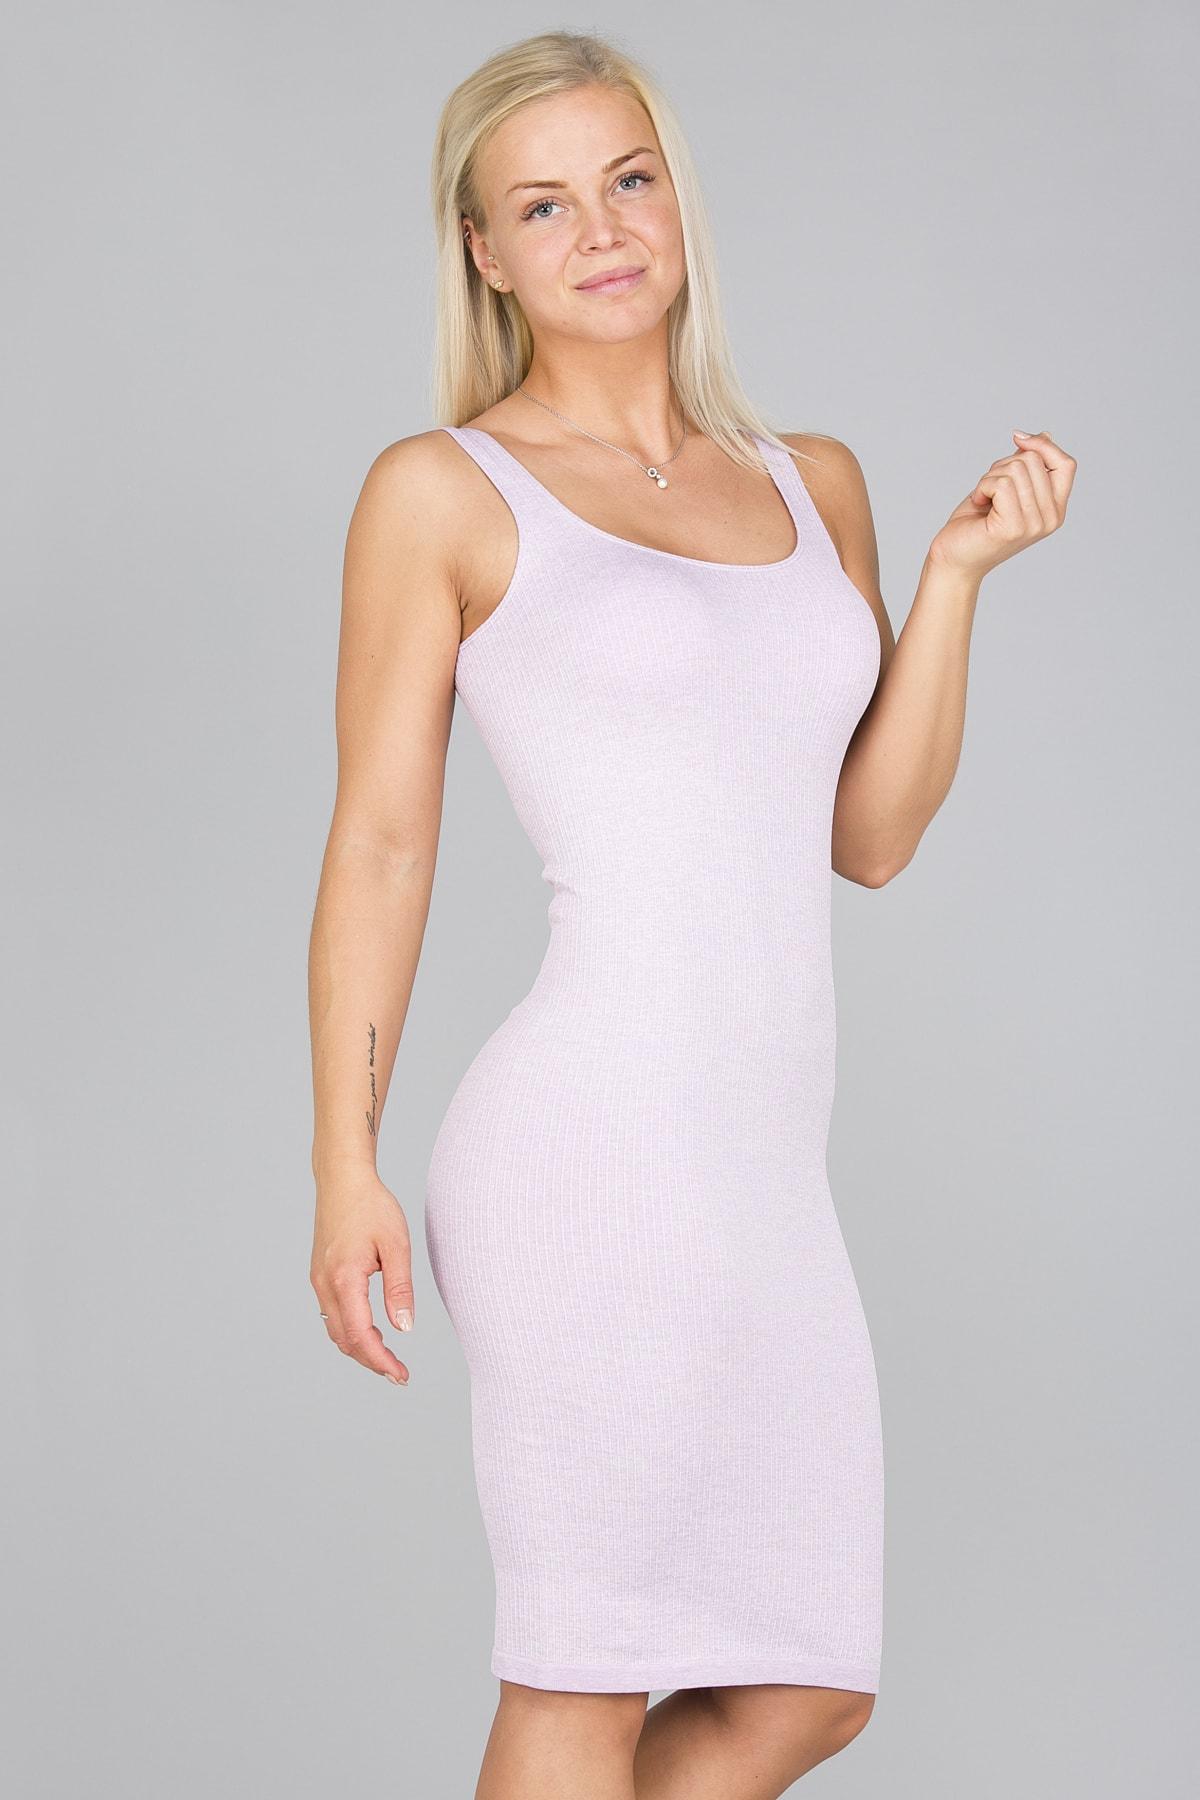 Aim'n Purple Ribbed Seamless Dress3